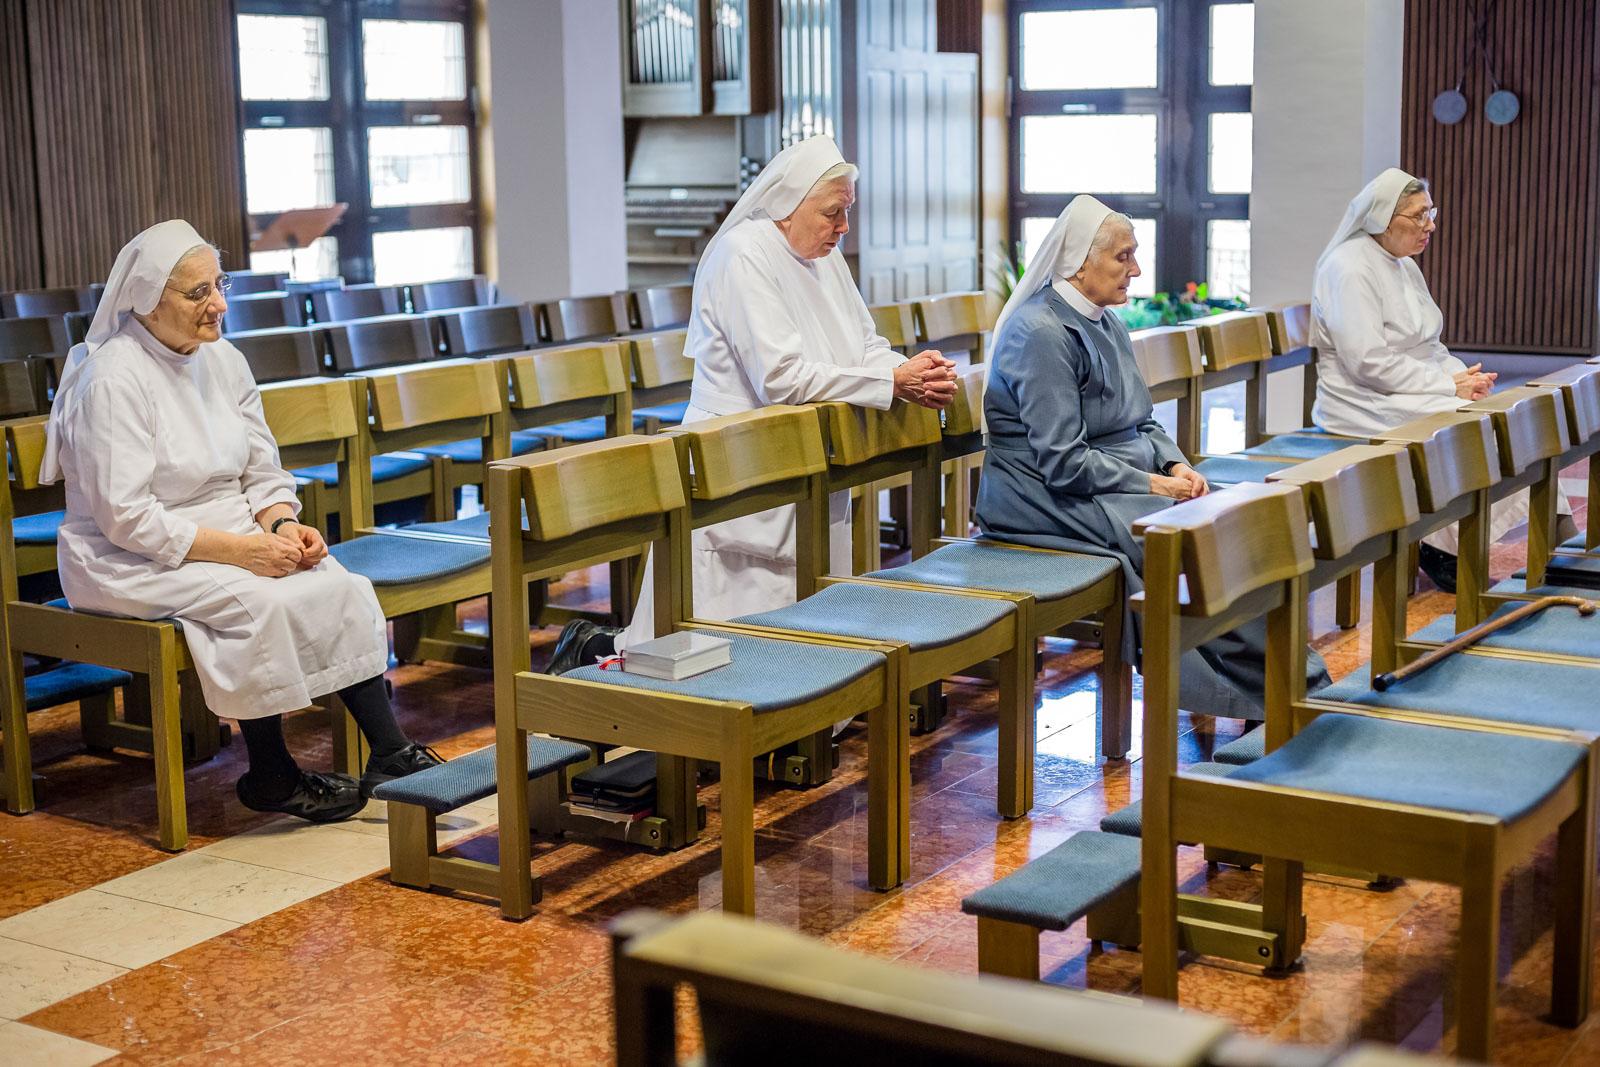 Gebet in der Kapelle